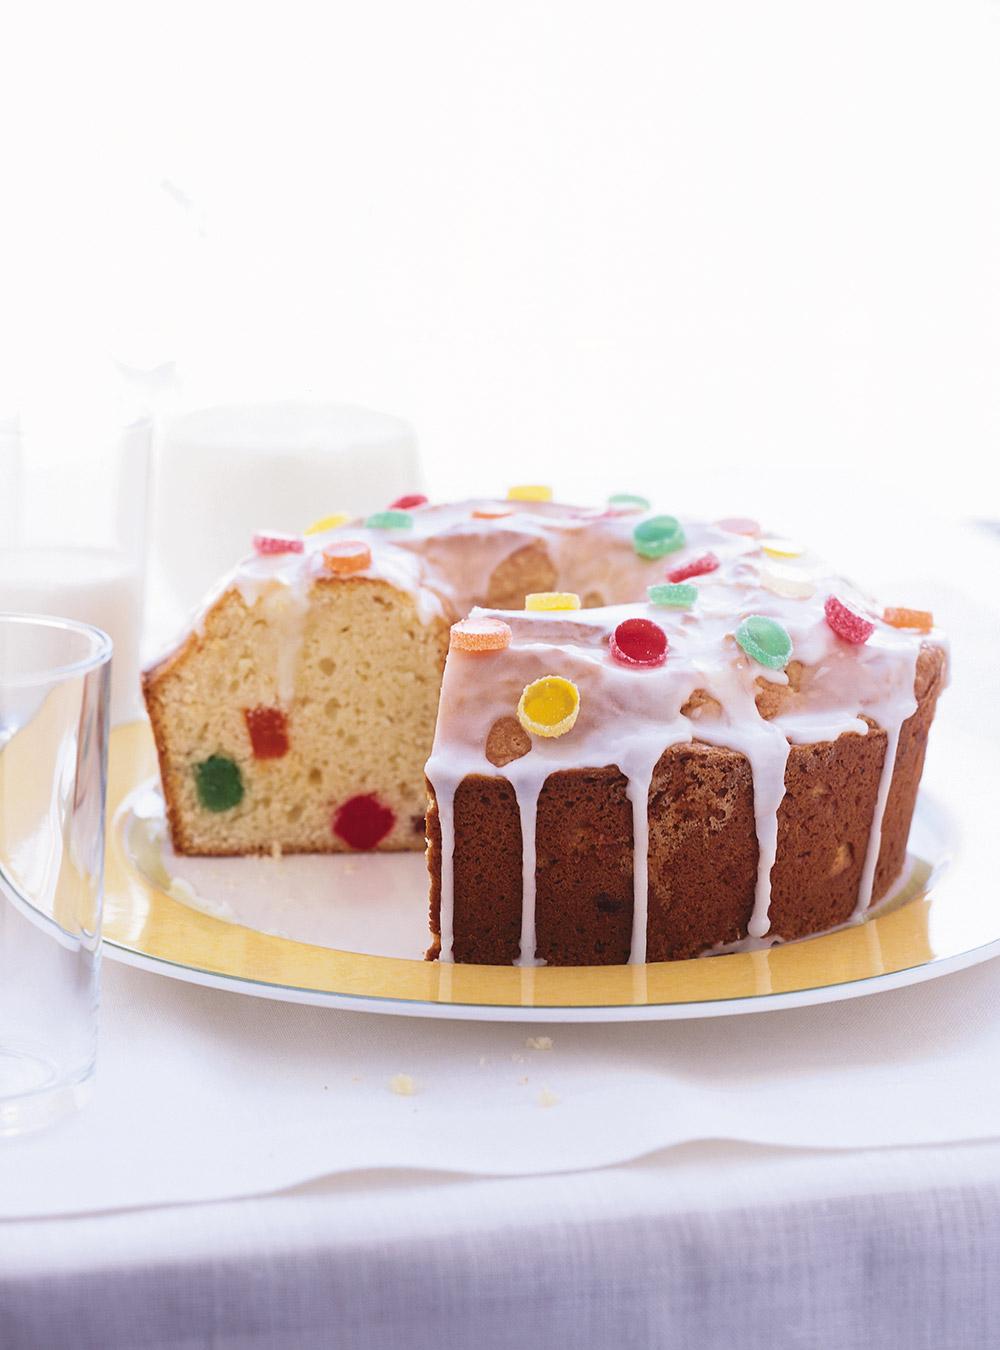 Gâteau aux jujubes | ricardo